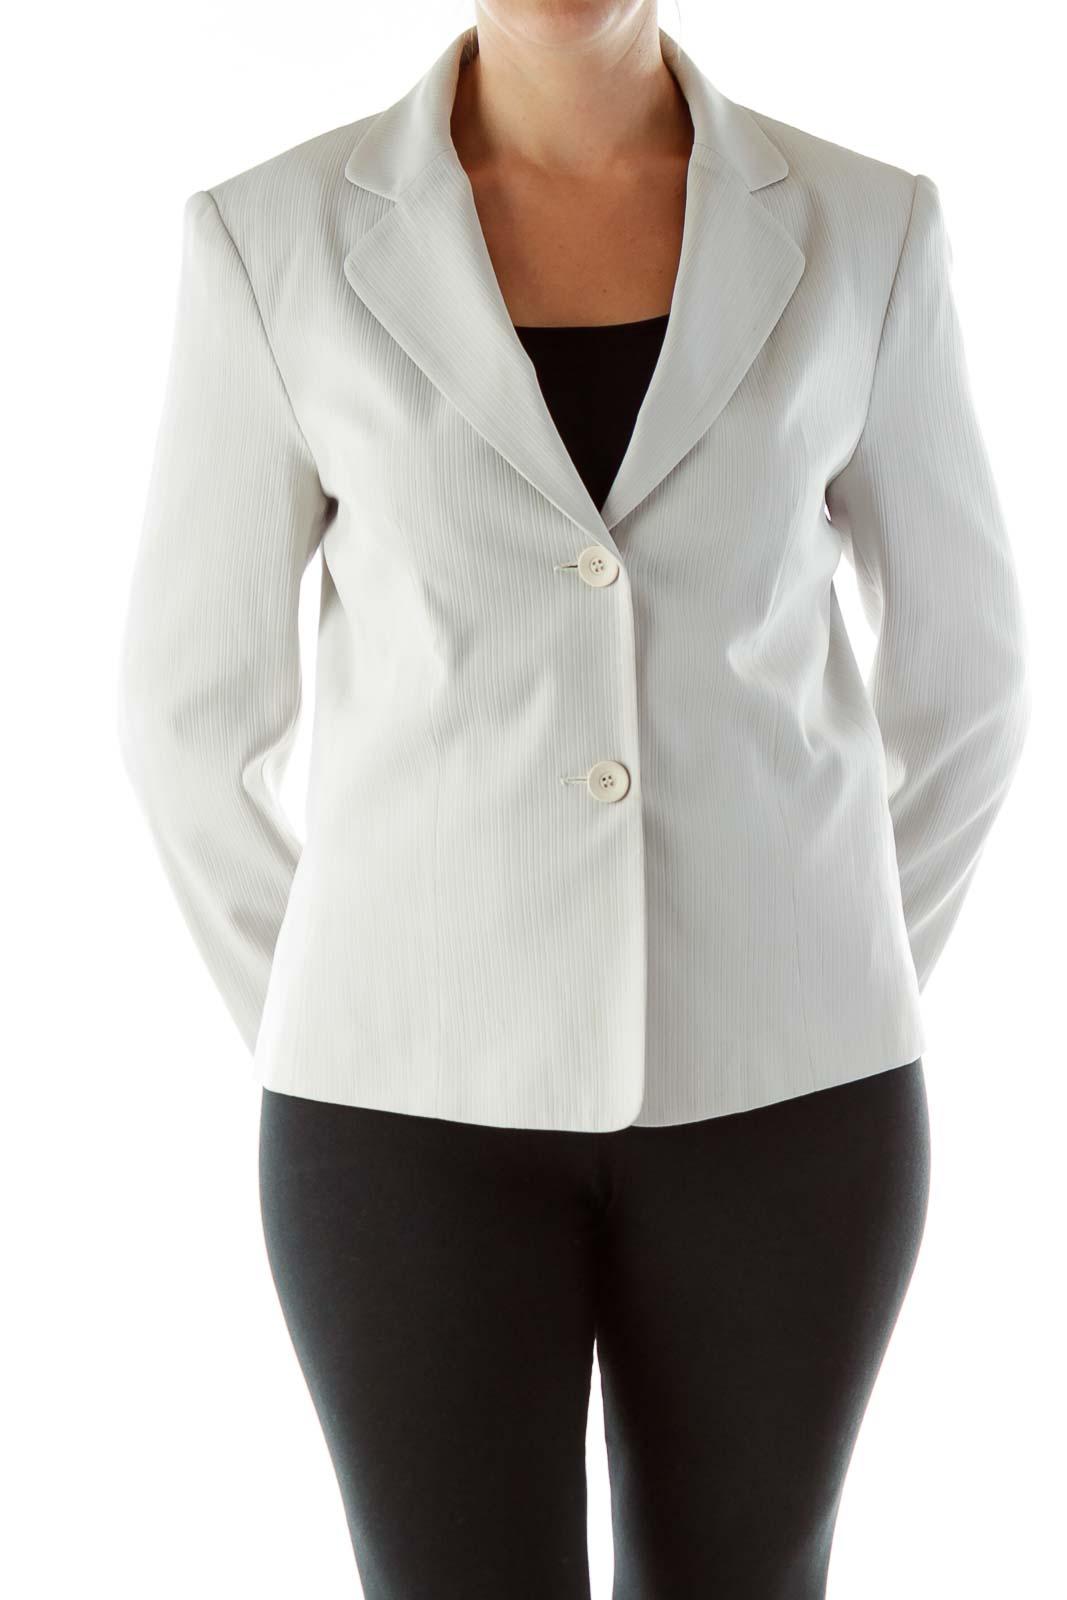 Gray Embossed Stripes Blazer Suit